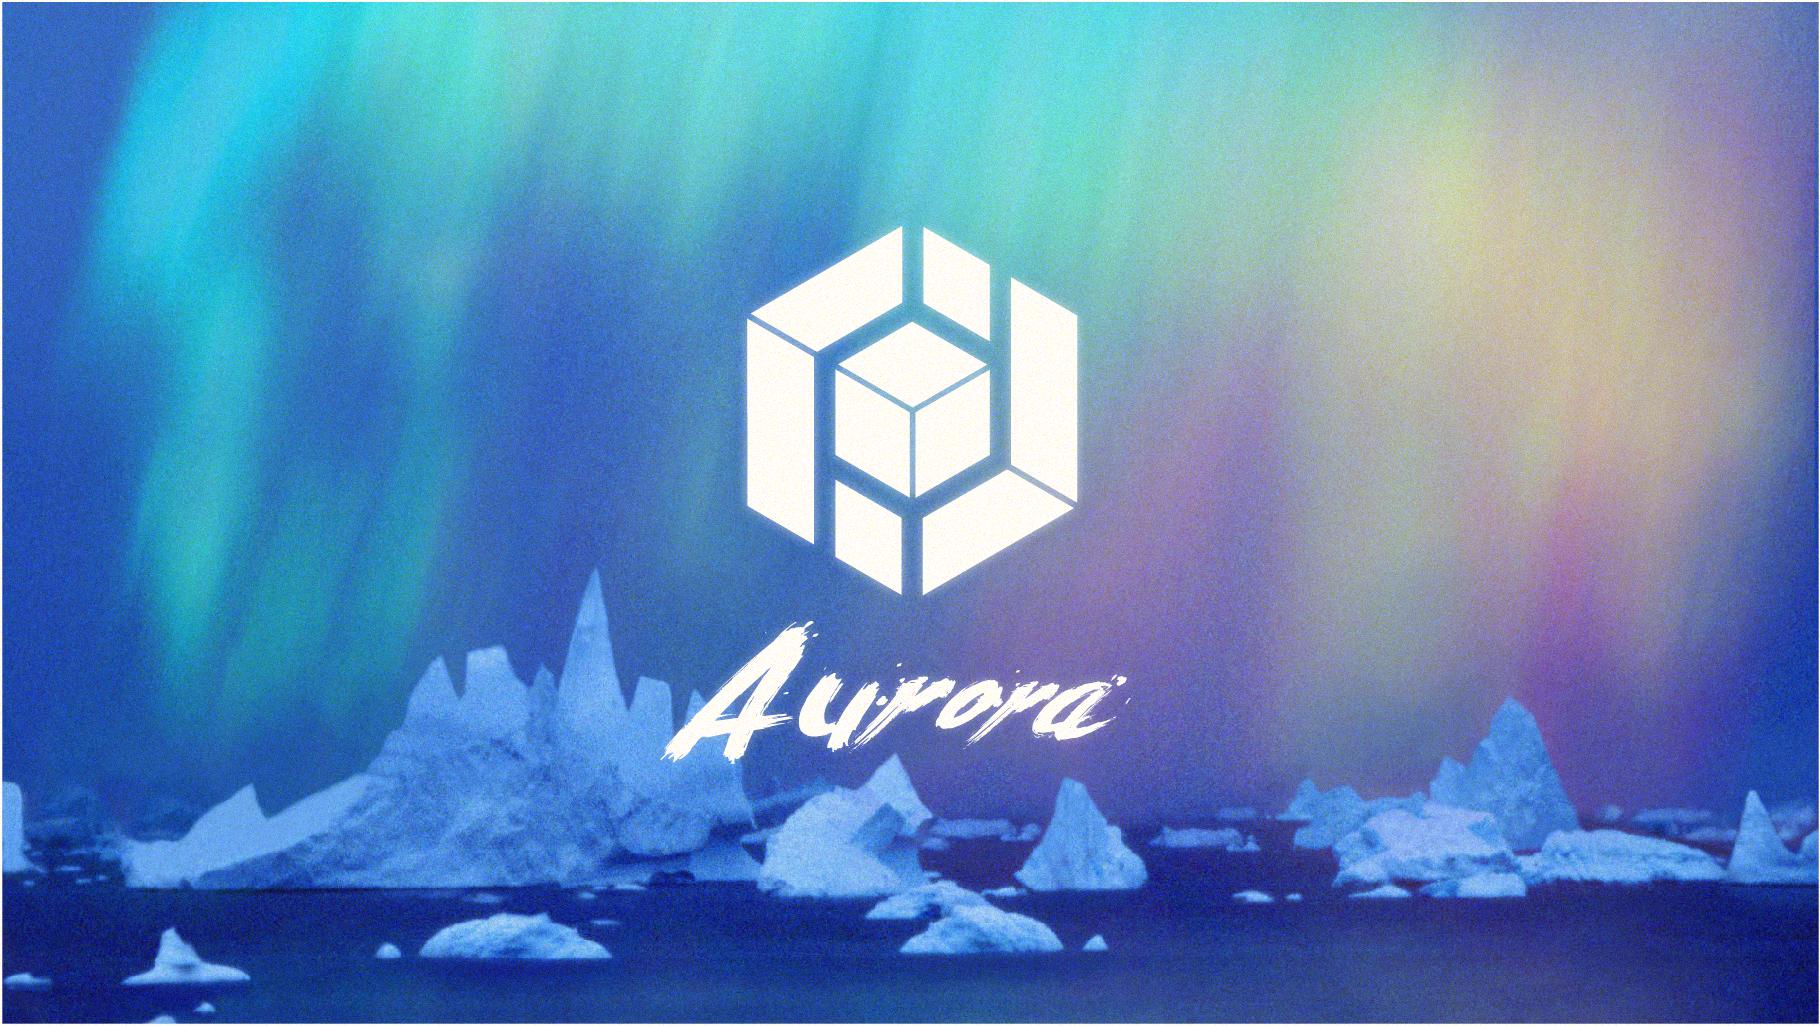 3589331_143647043493_Jumper-Aurora.png